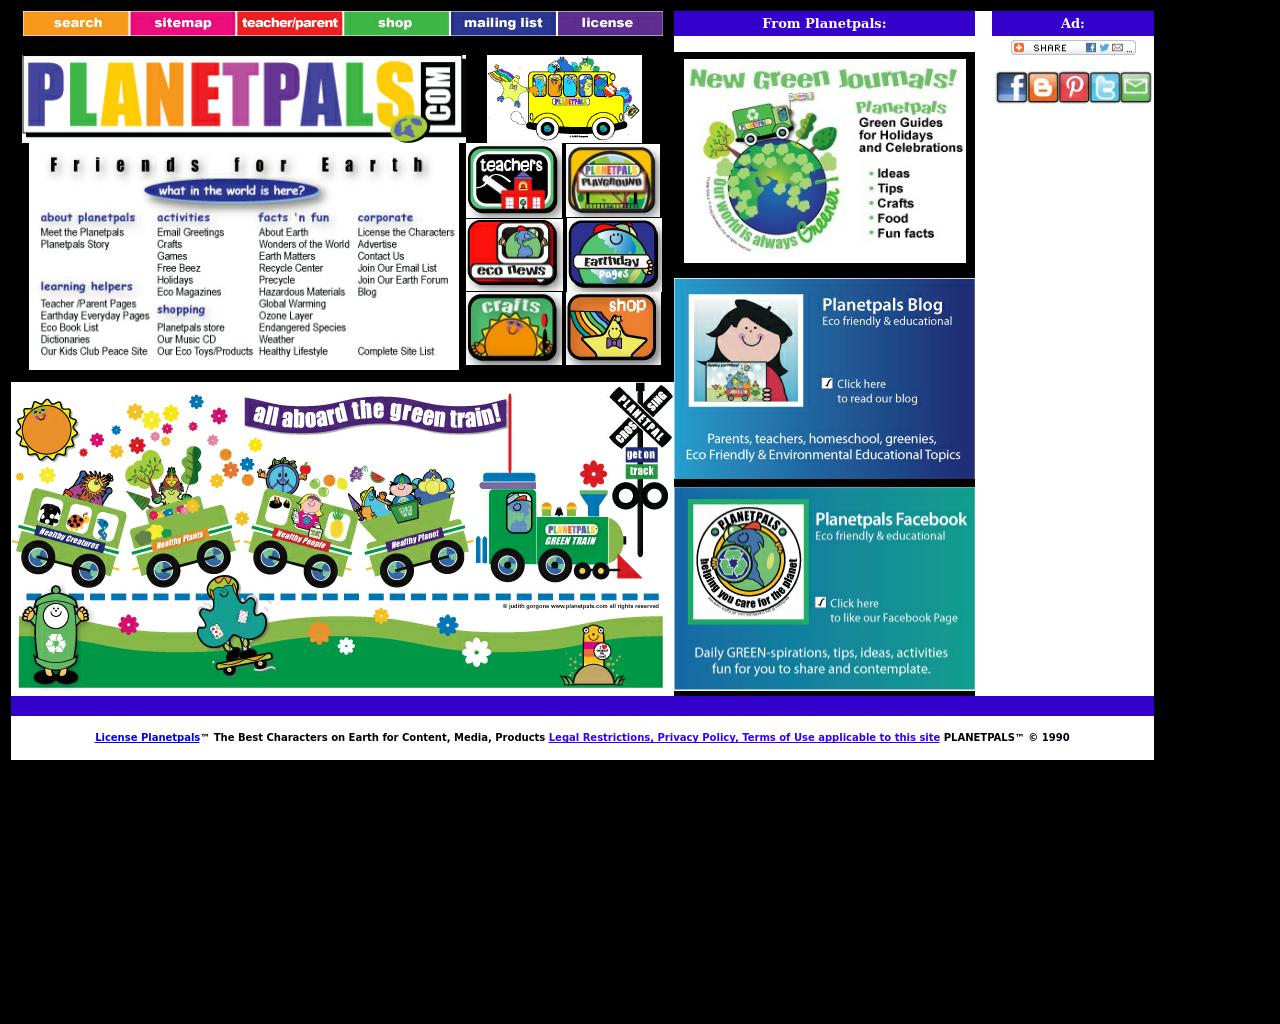 Planetpals.com-Advertising-Reviews-Pricing